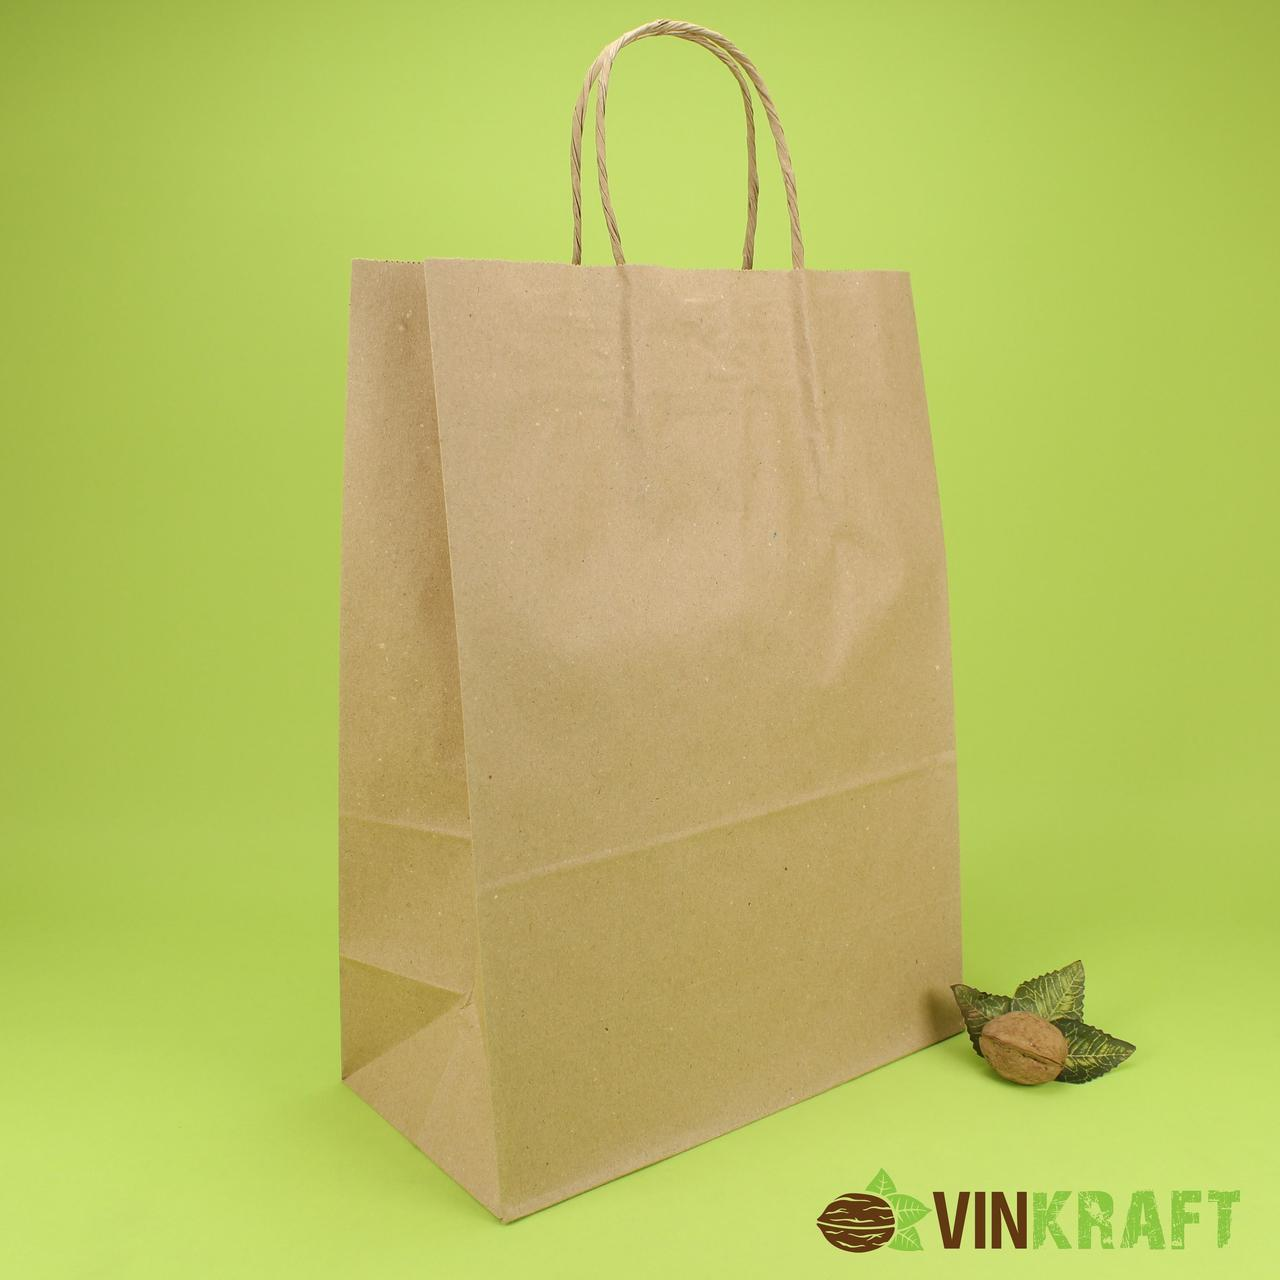 Паперовий пакет з ручками 260*130*350 (70 г/м2) (5 кг), крафт